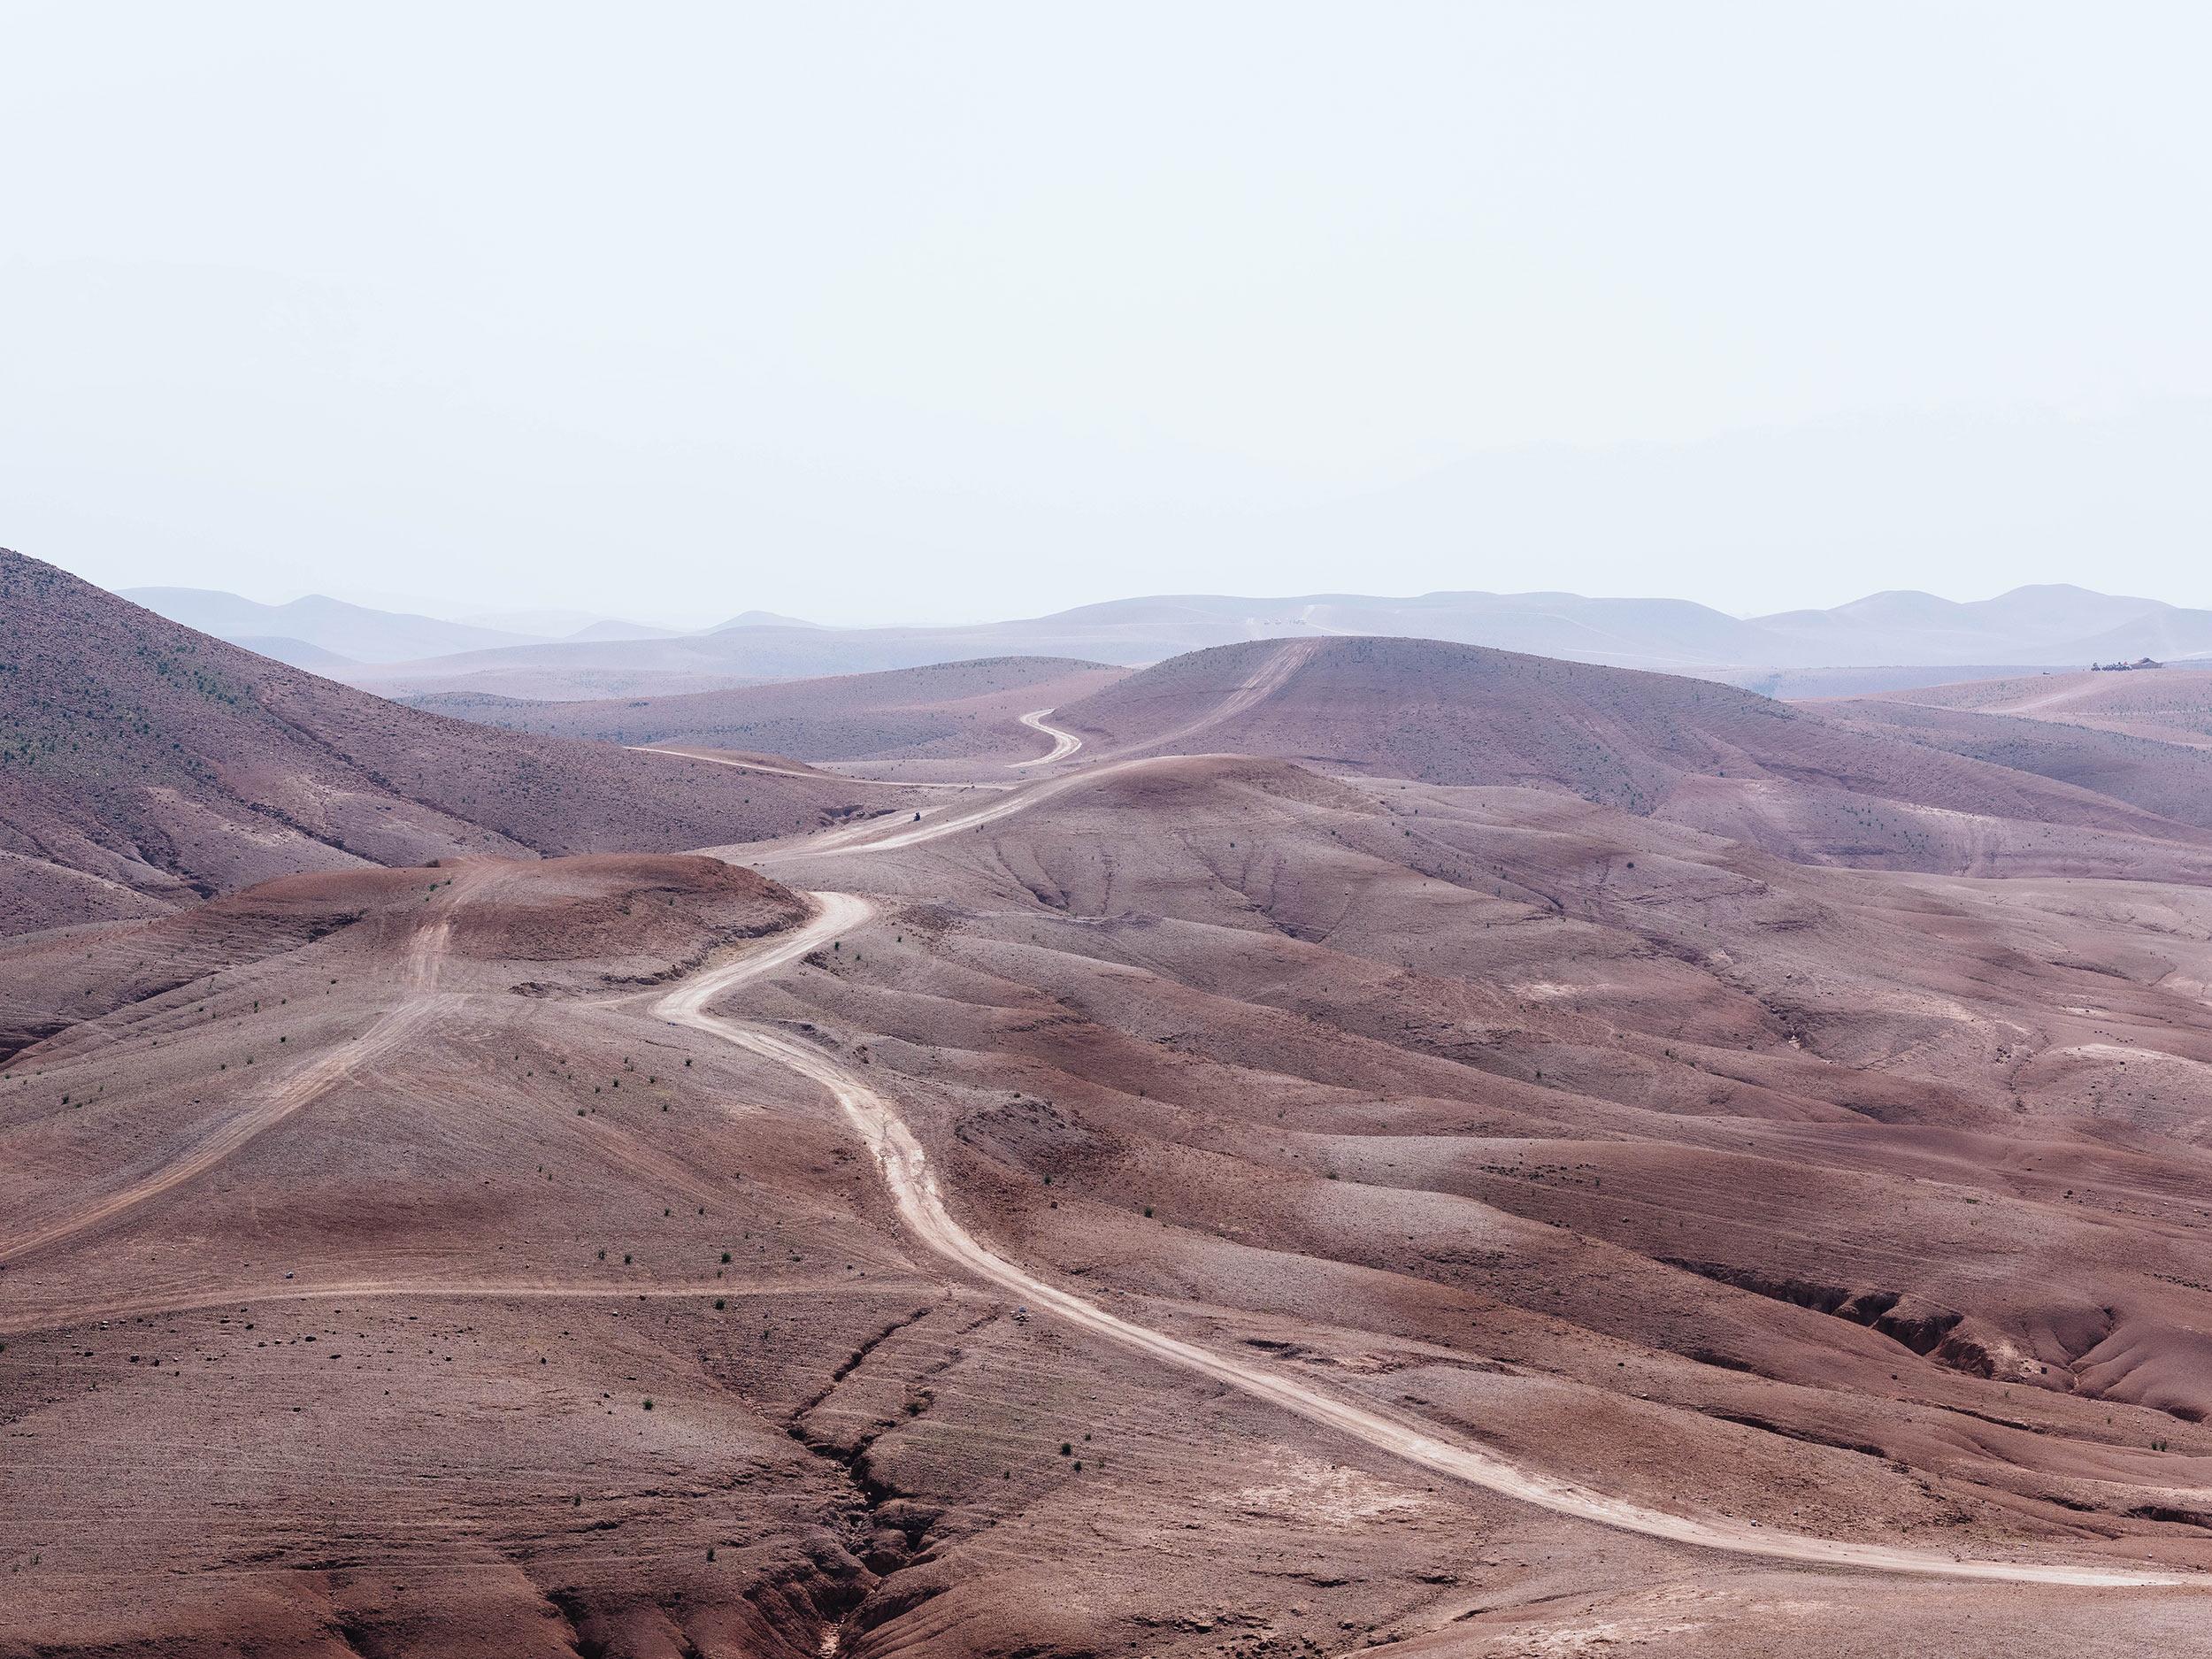 Morocco-08165.jpg